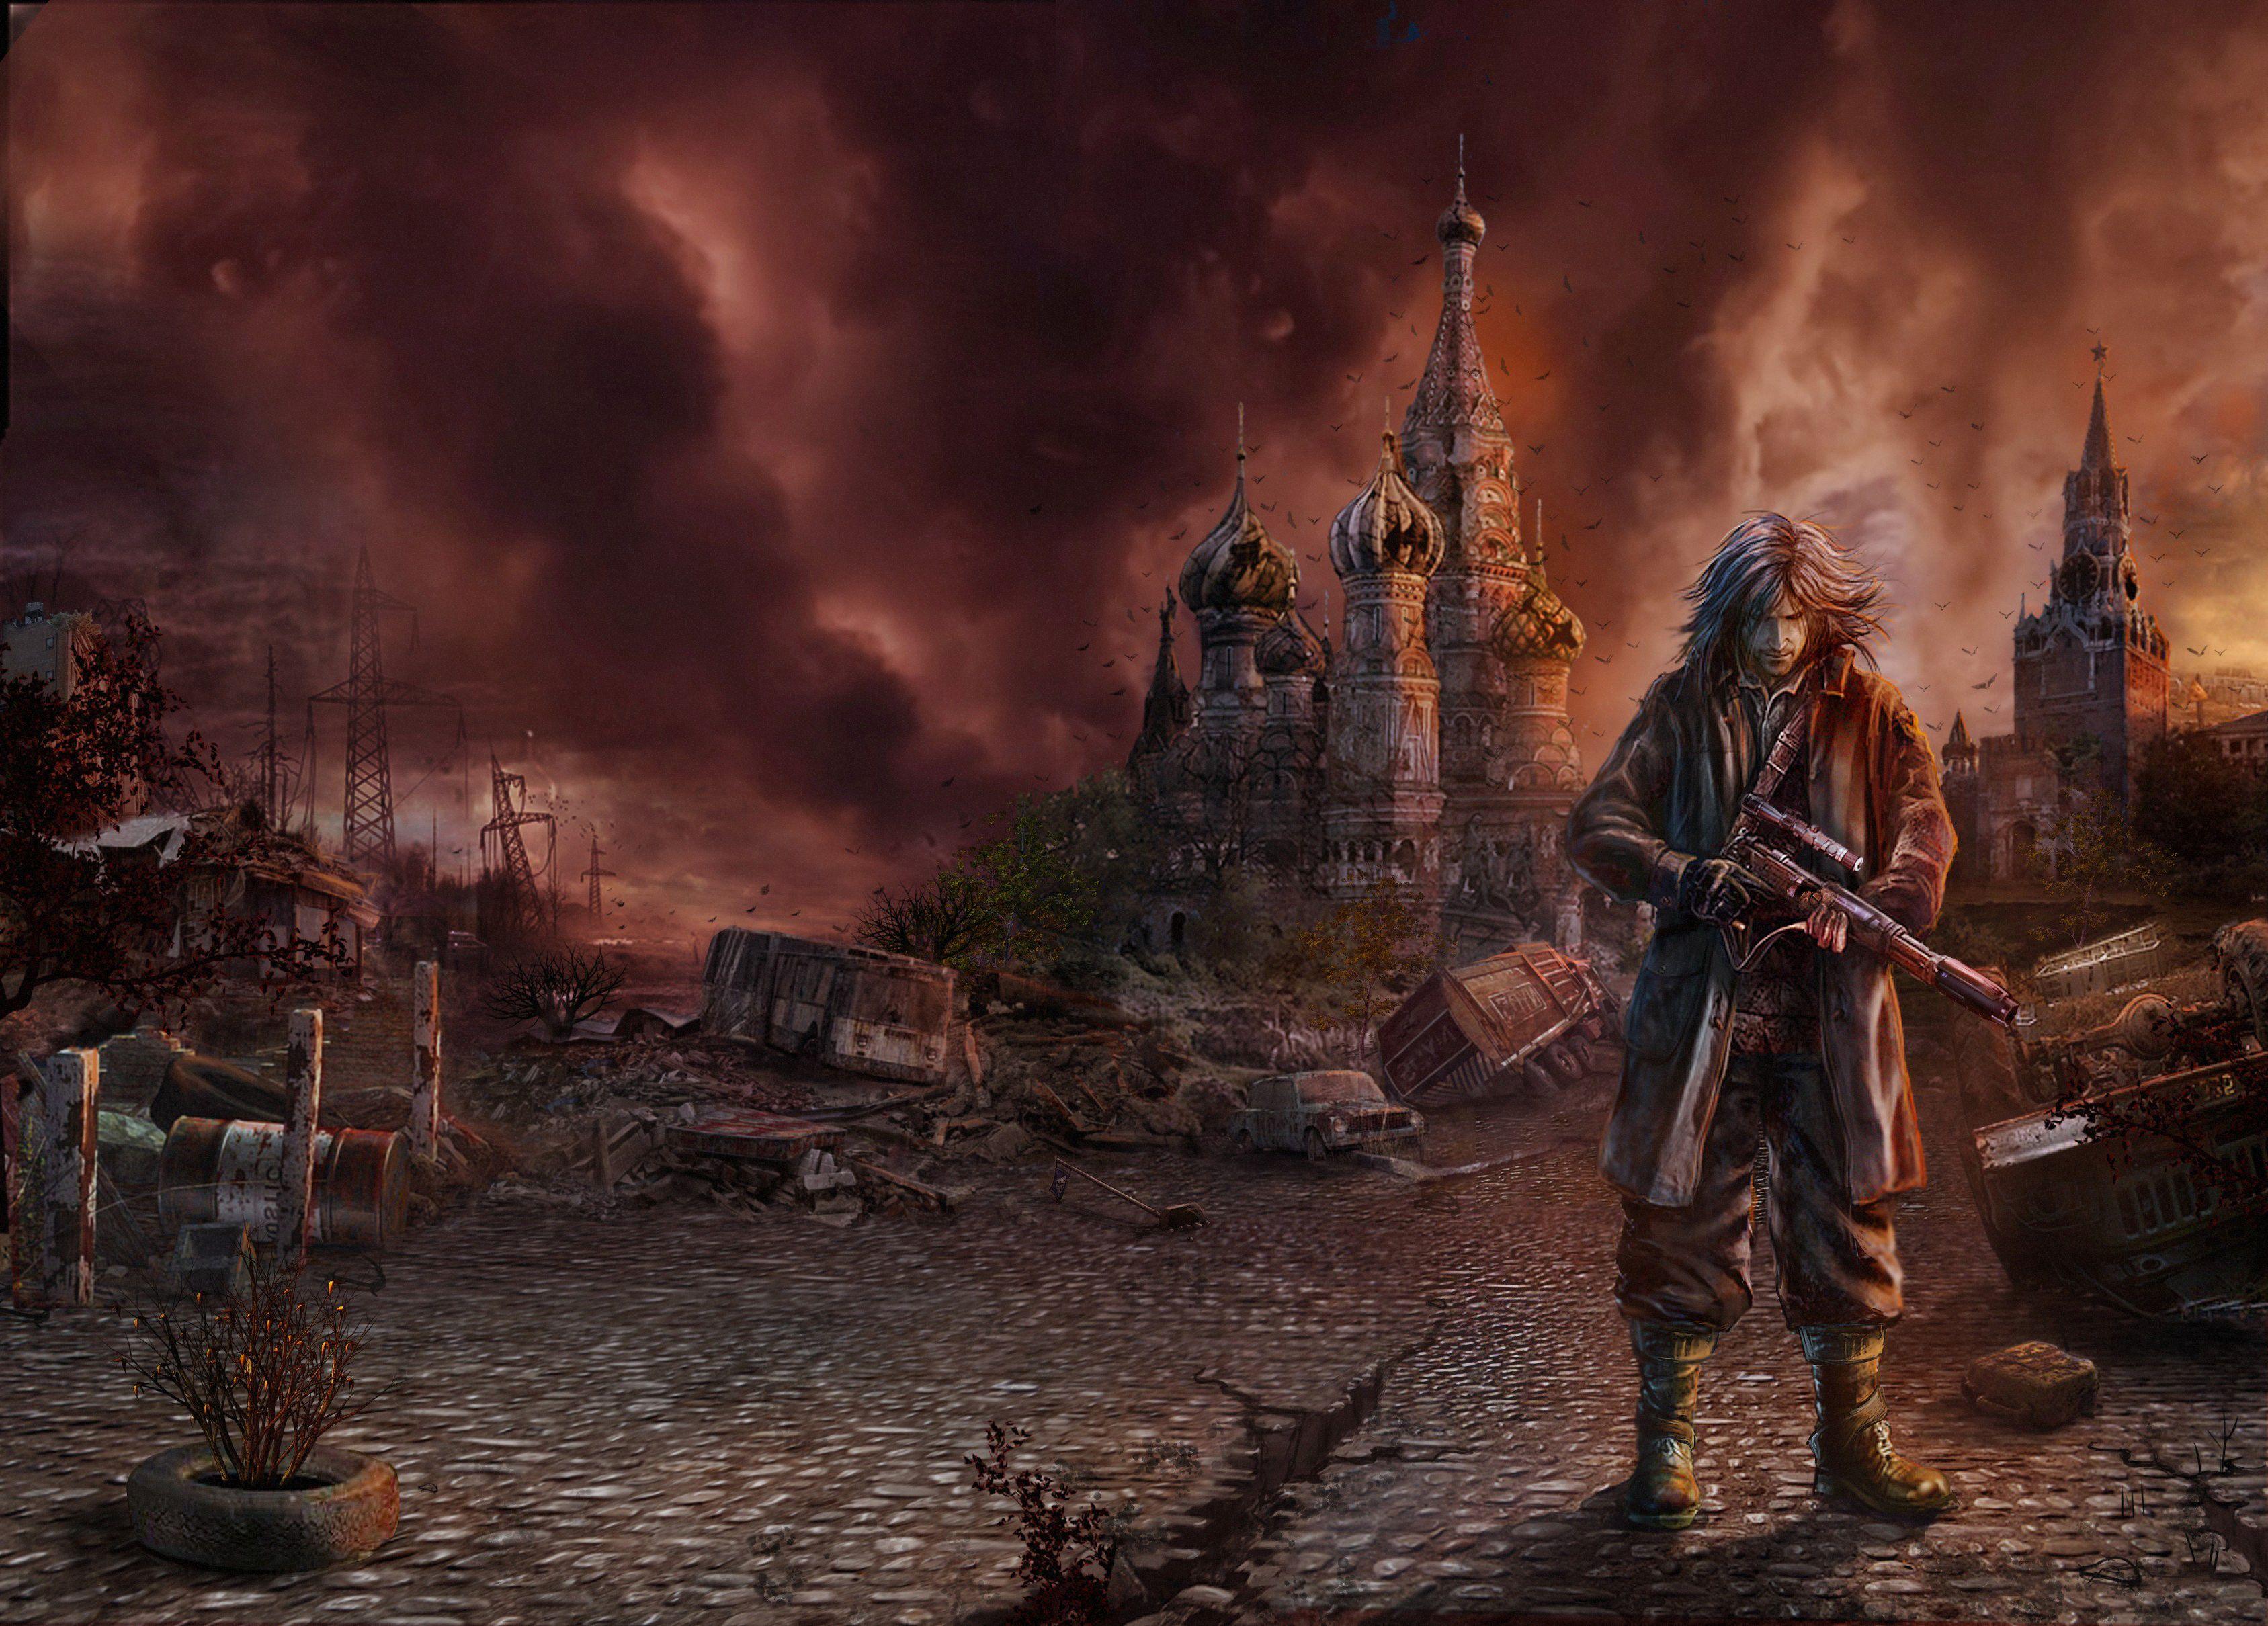 Картинки сергей тармашев древний постапокалипсис